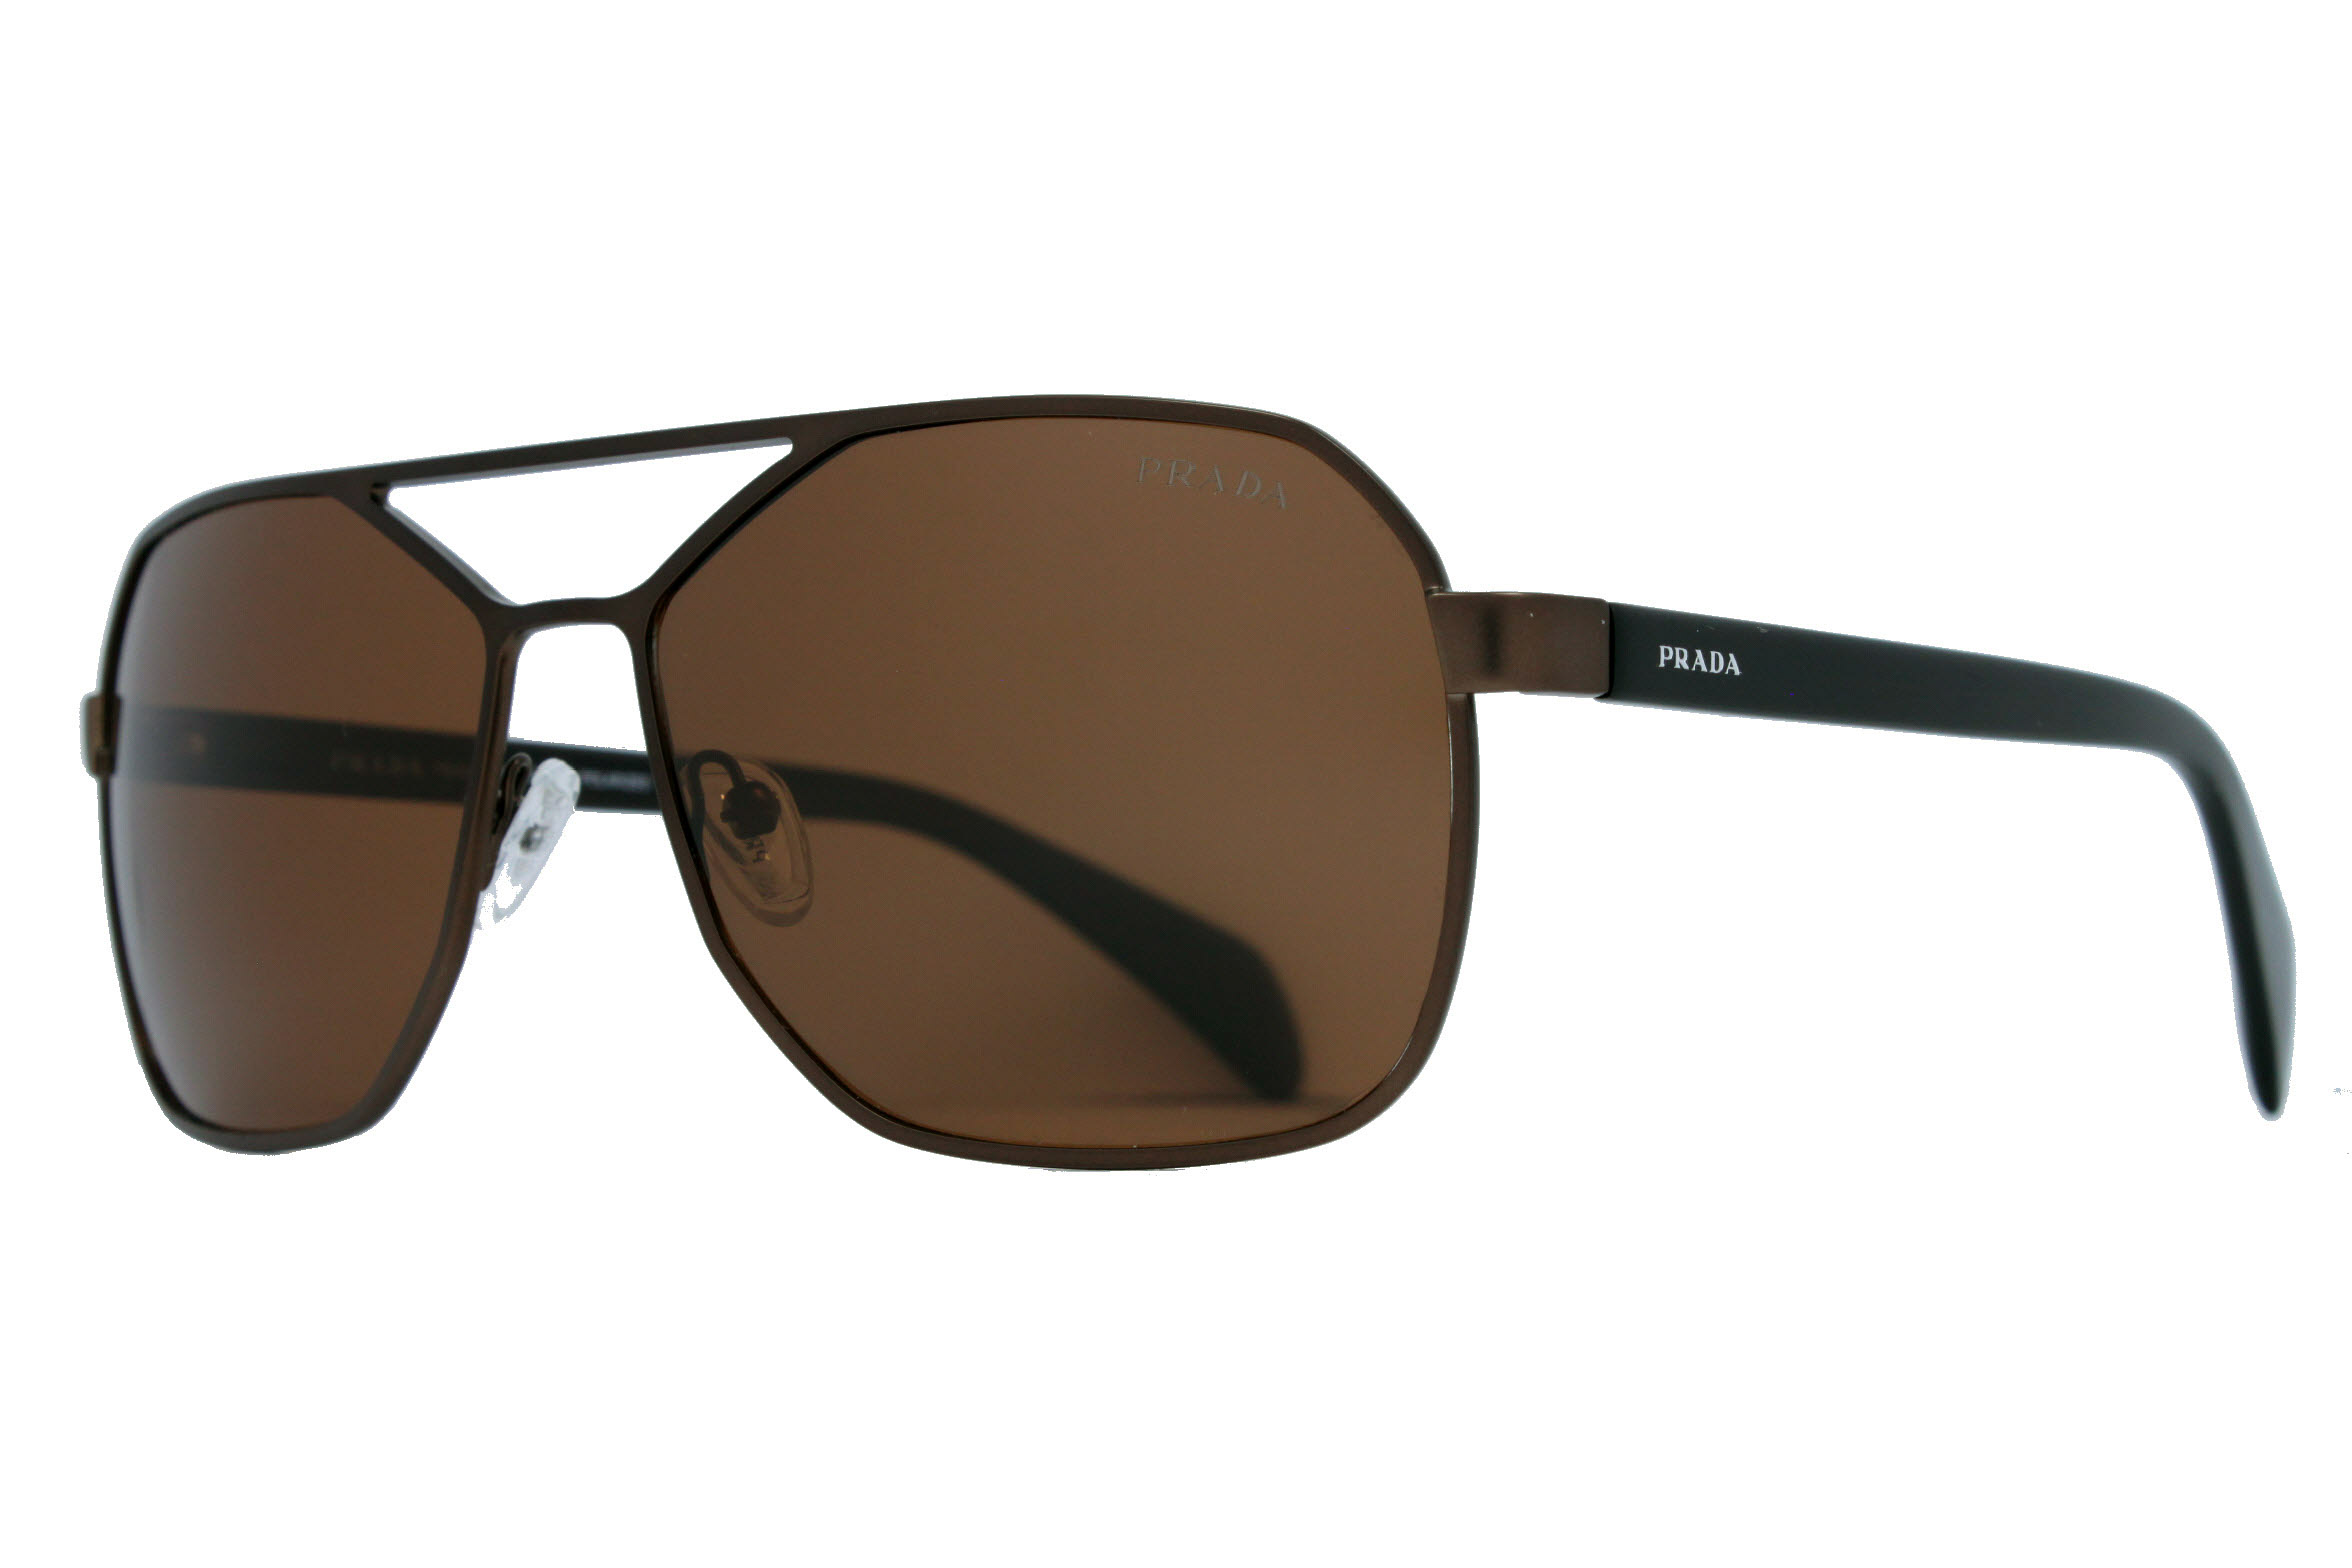 عینک آفتابی پرادا PRADA